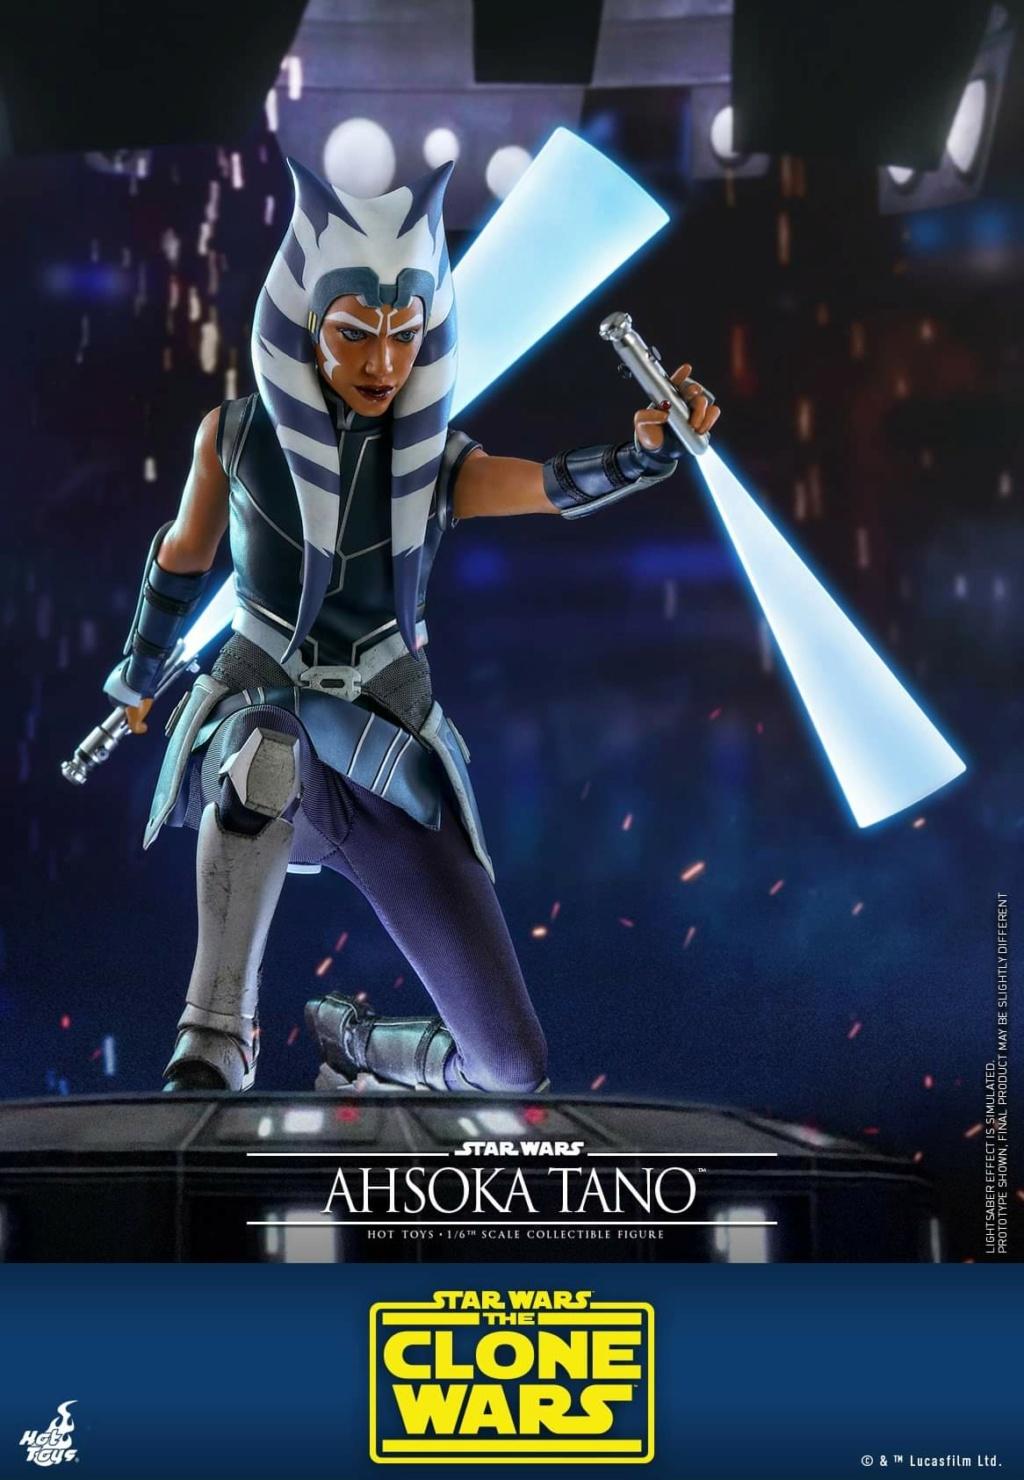 Ahsoka Tano - 1/6th scale - The Clone Wars - Hot Toys Fb_im135